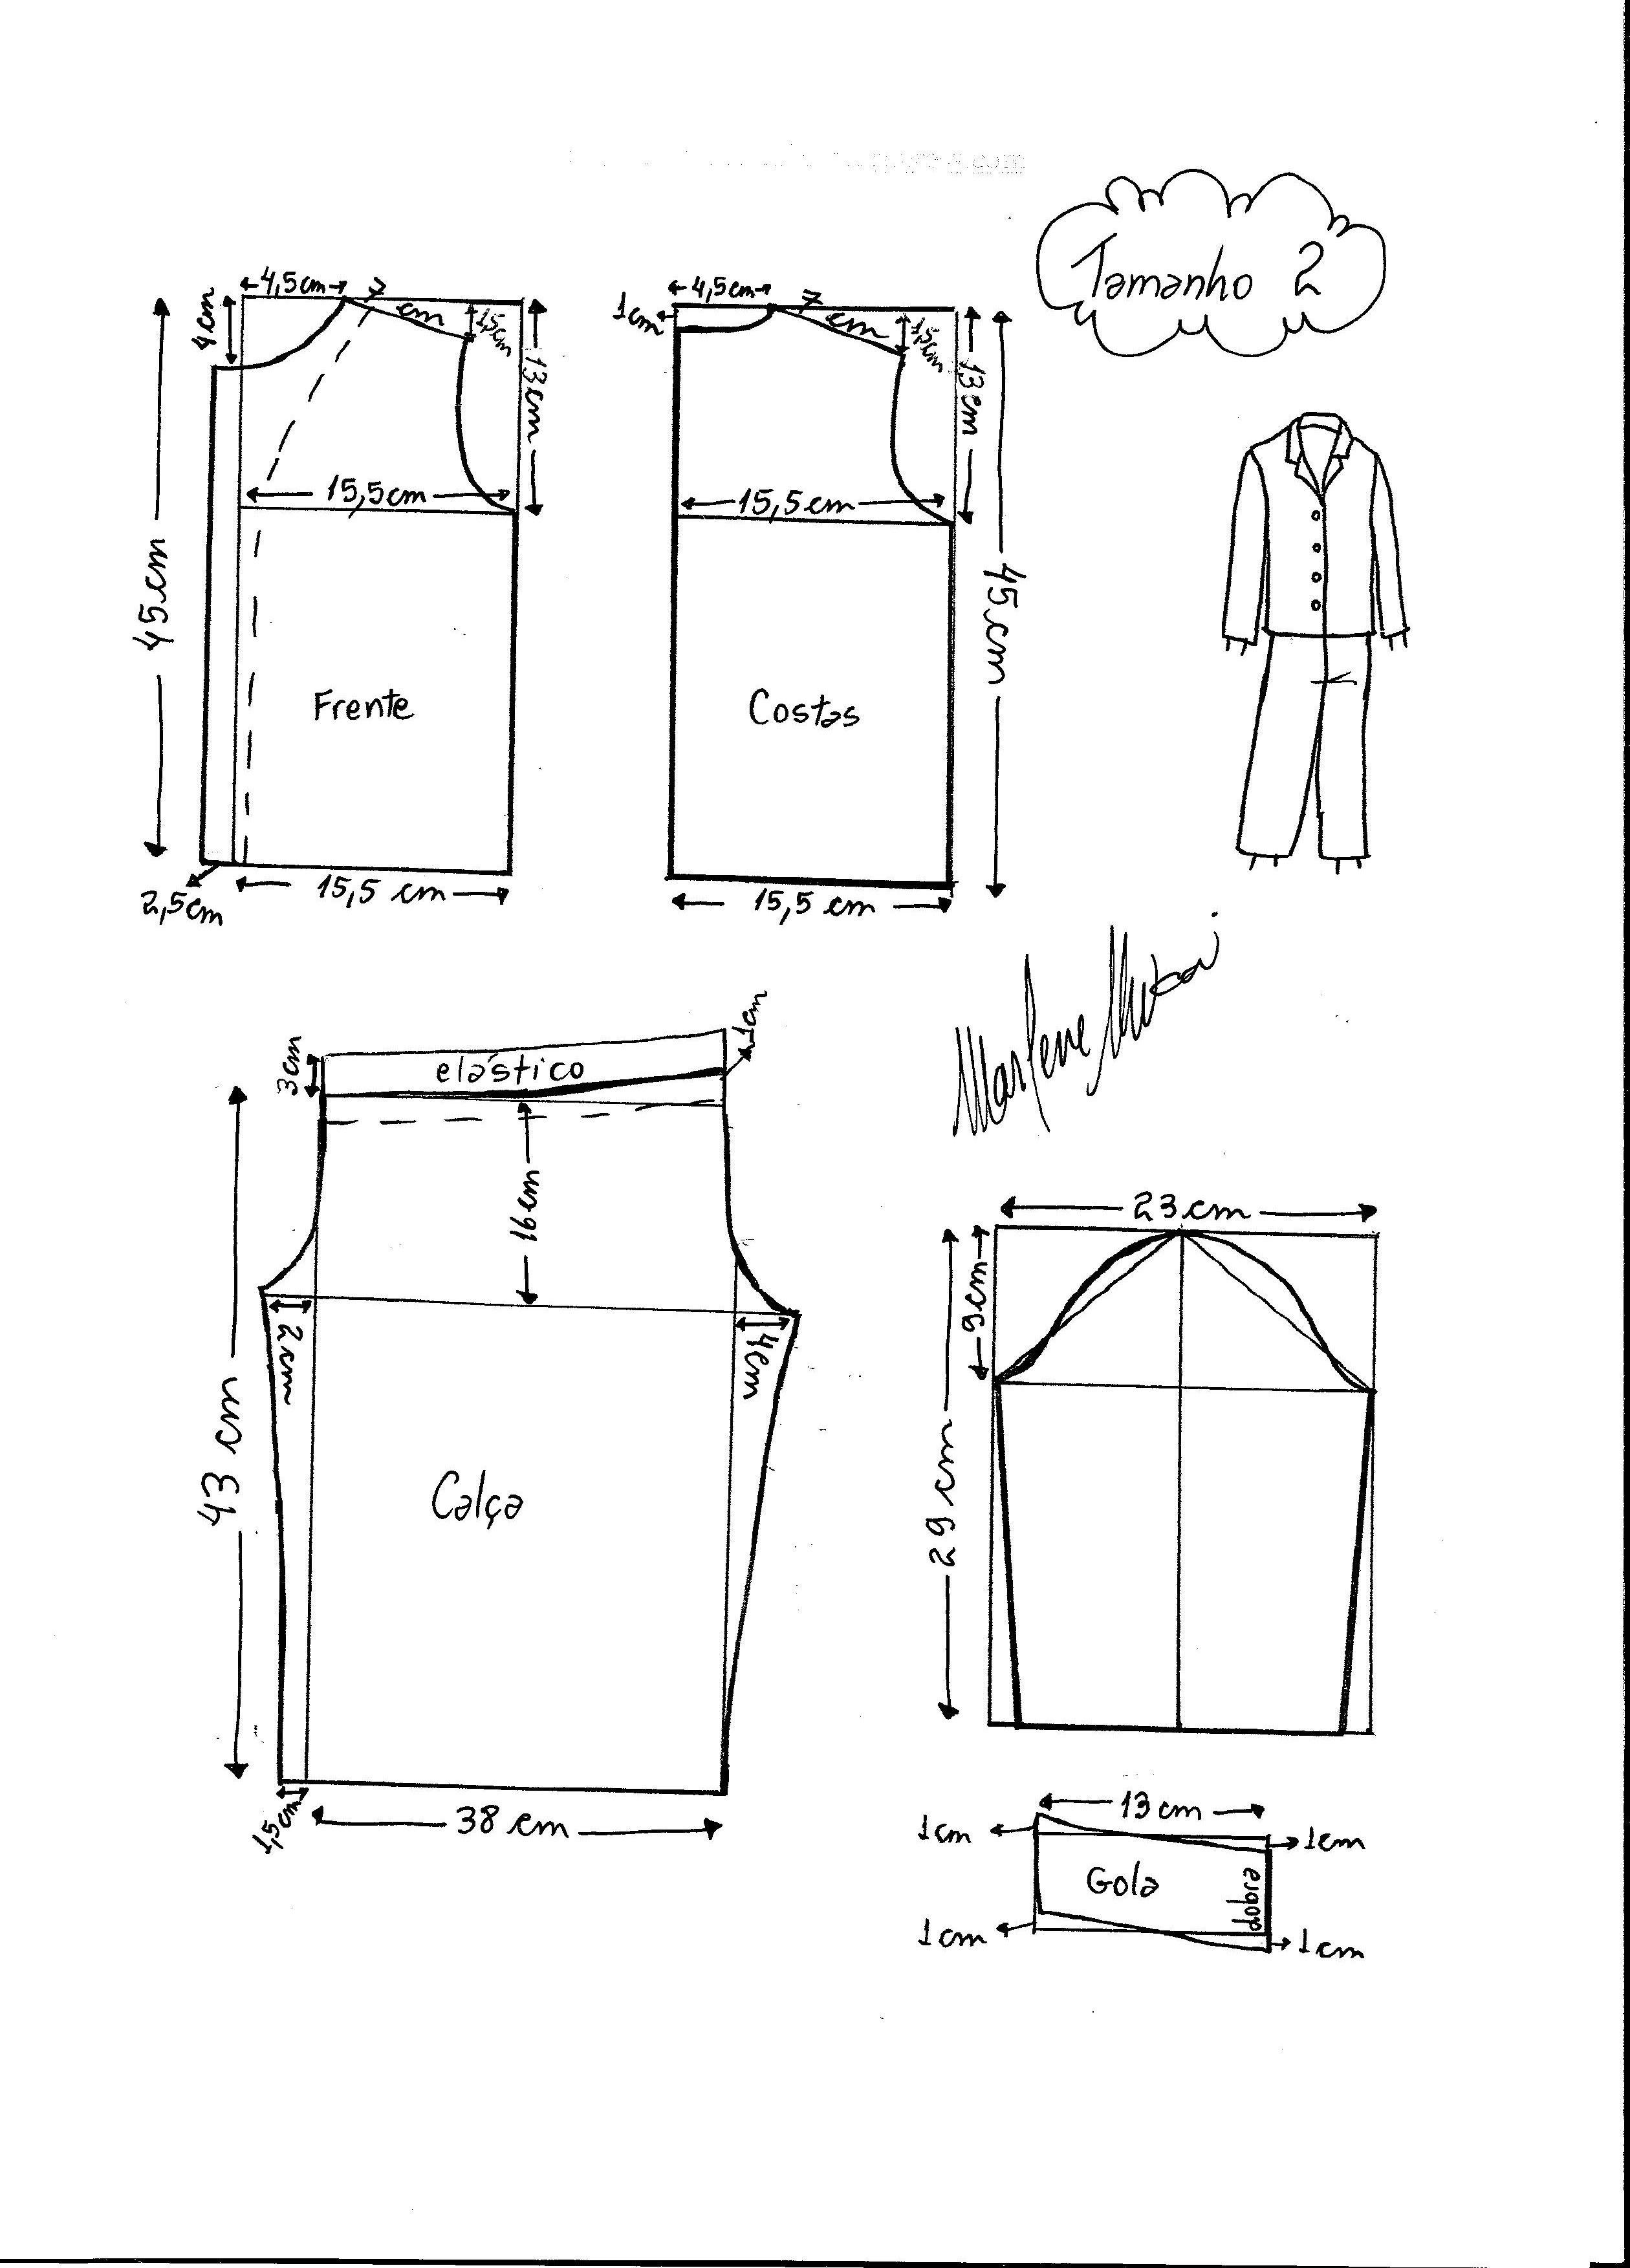 Pin de Maria Ramirez de Lozano en Costura | Pinterest | Sewing ...